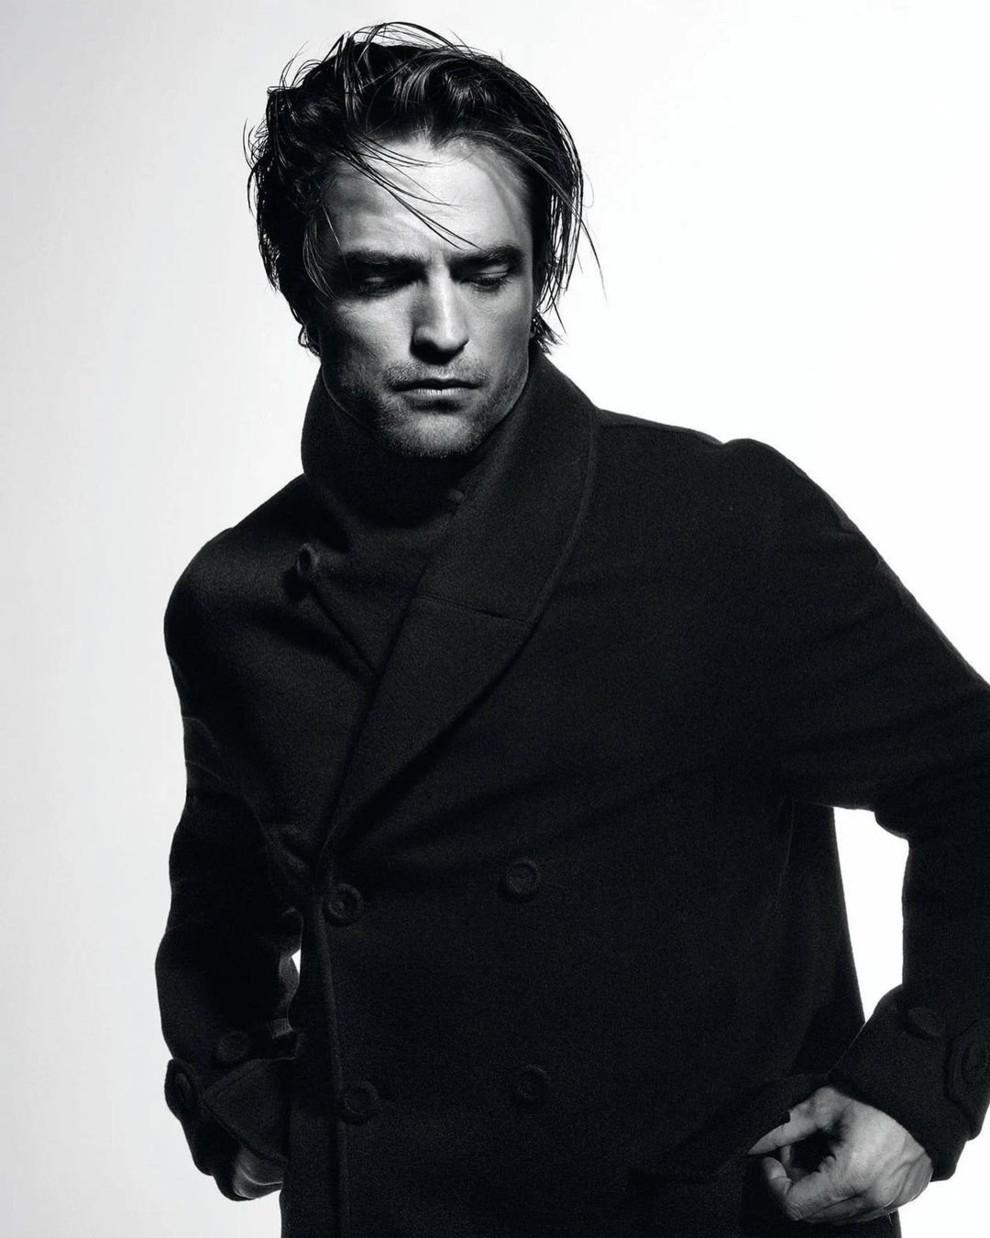 Любуемся: Роберт Паттинсон снялся в рекламной кампании Dior Homme (ФОТО) - фото №3